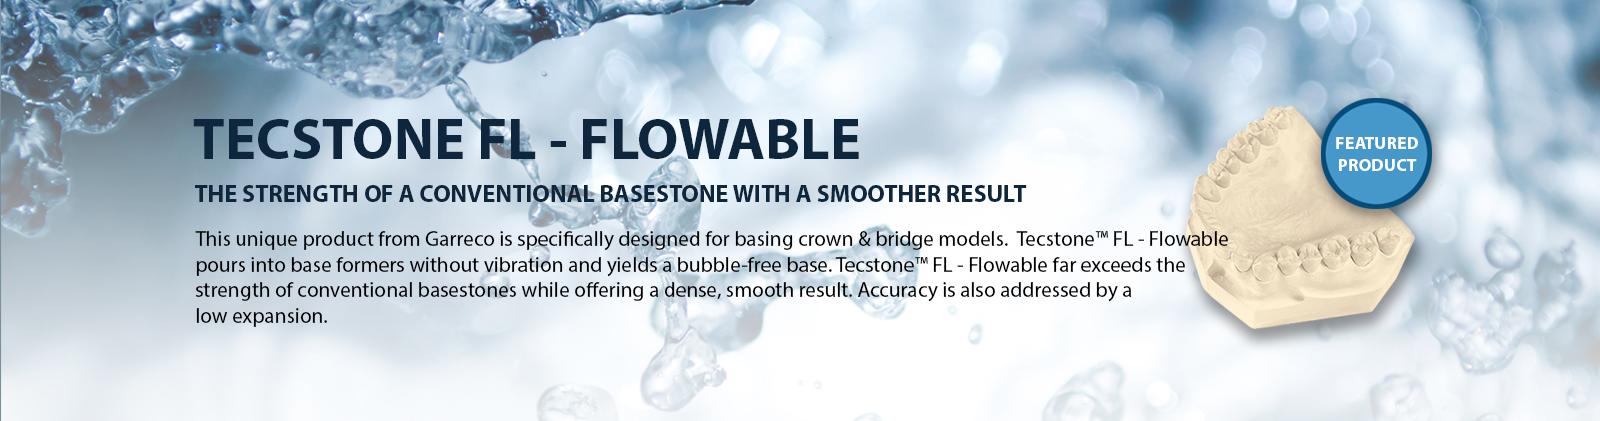 Tecstone-Flowable-Slideshow-Banner3